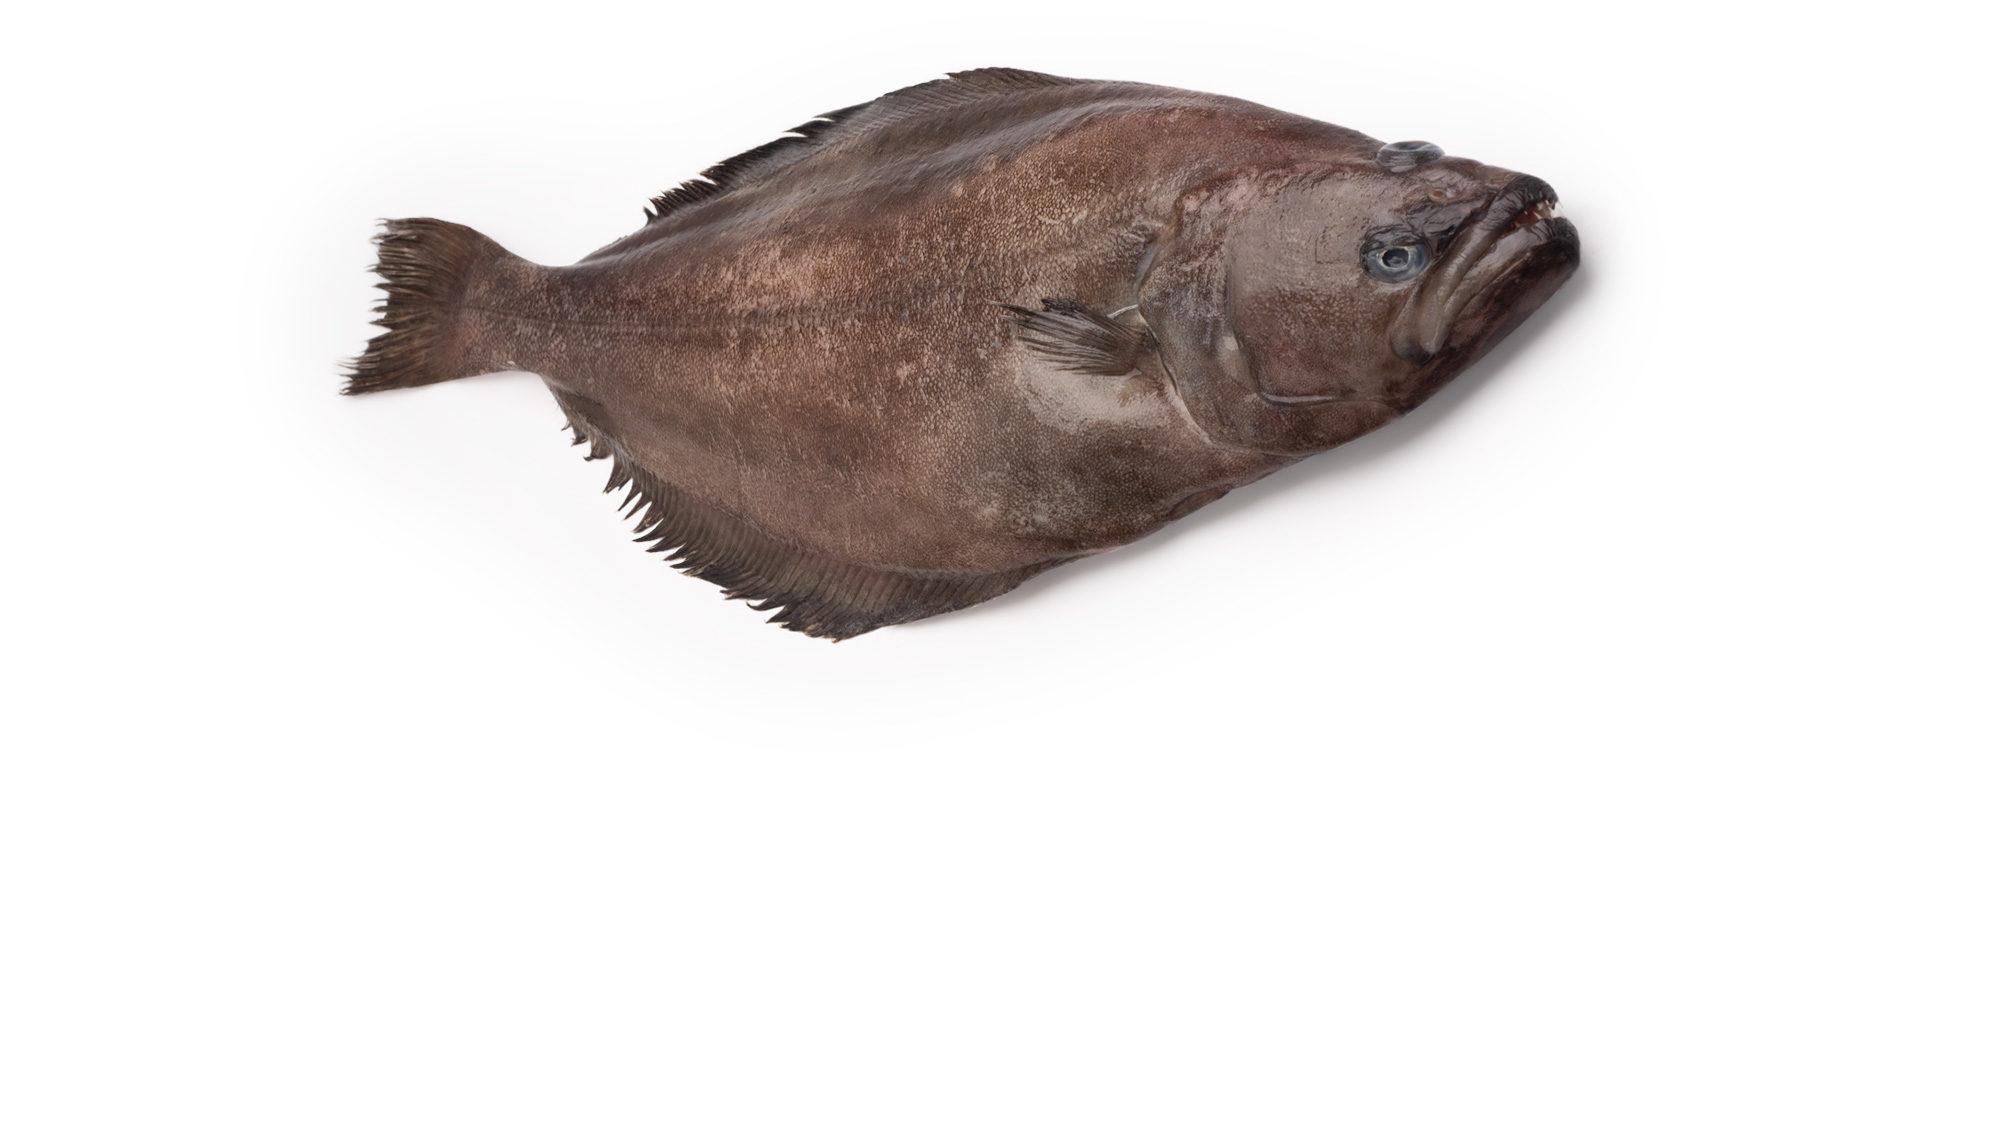 halibut-greenland-turbot-reinhardtius-hippoglossoides